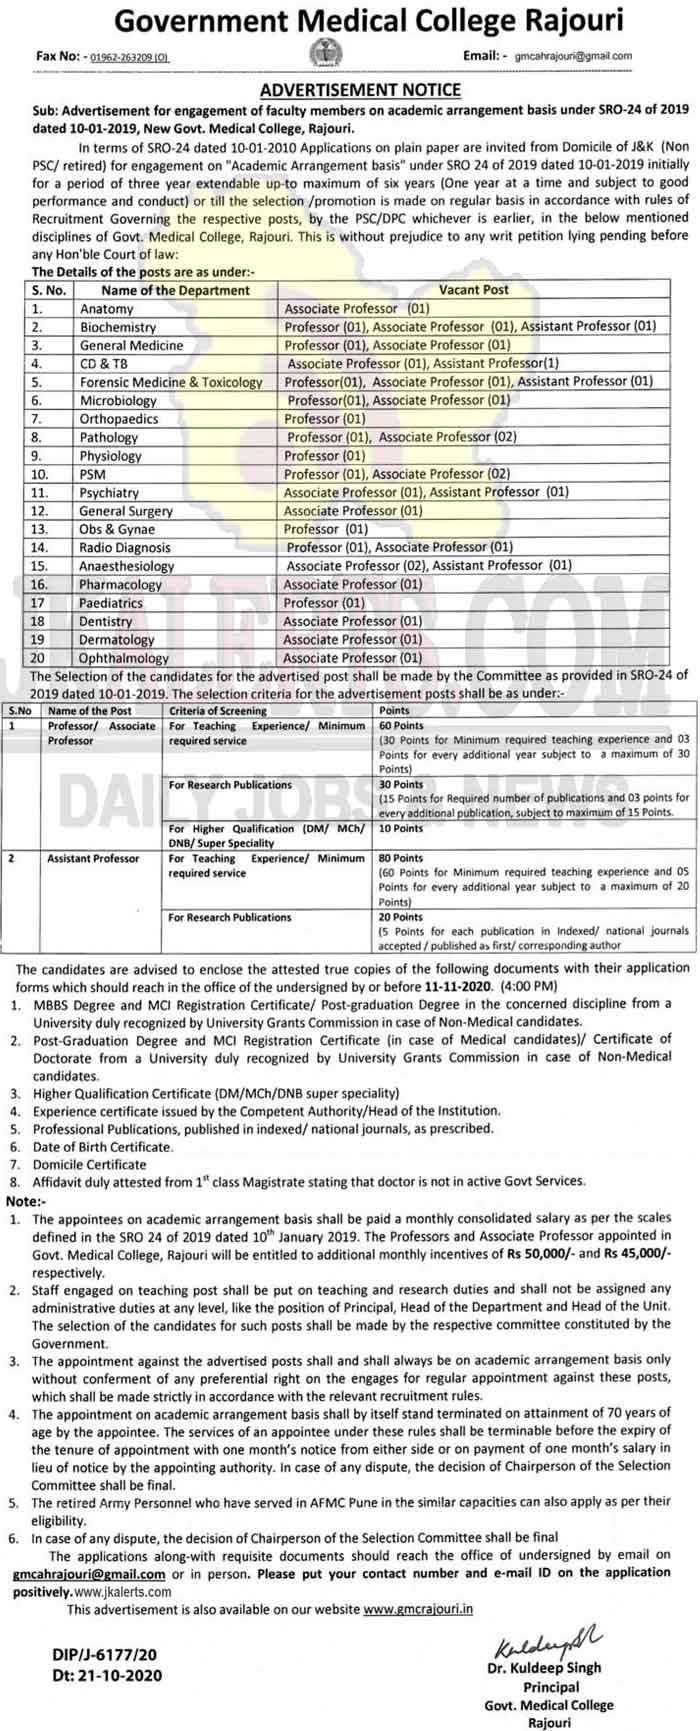 GMC Rajouri Job recruitment 2020.